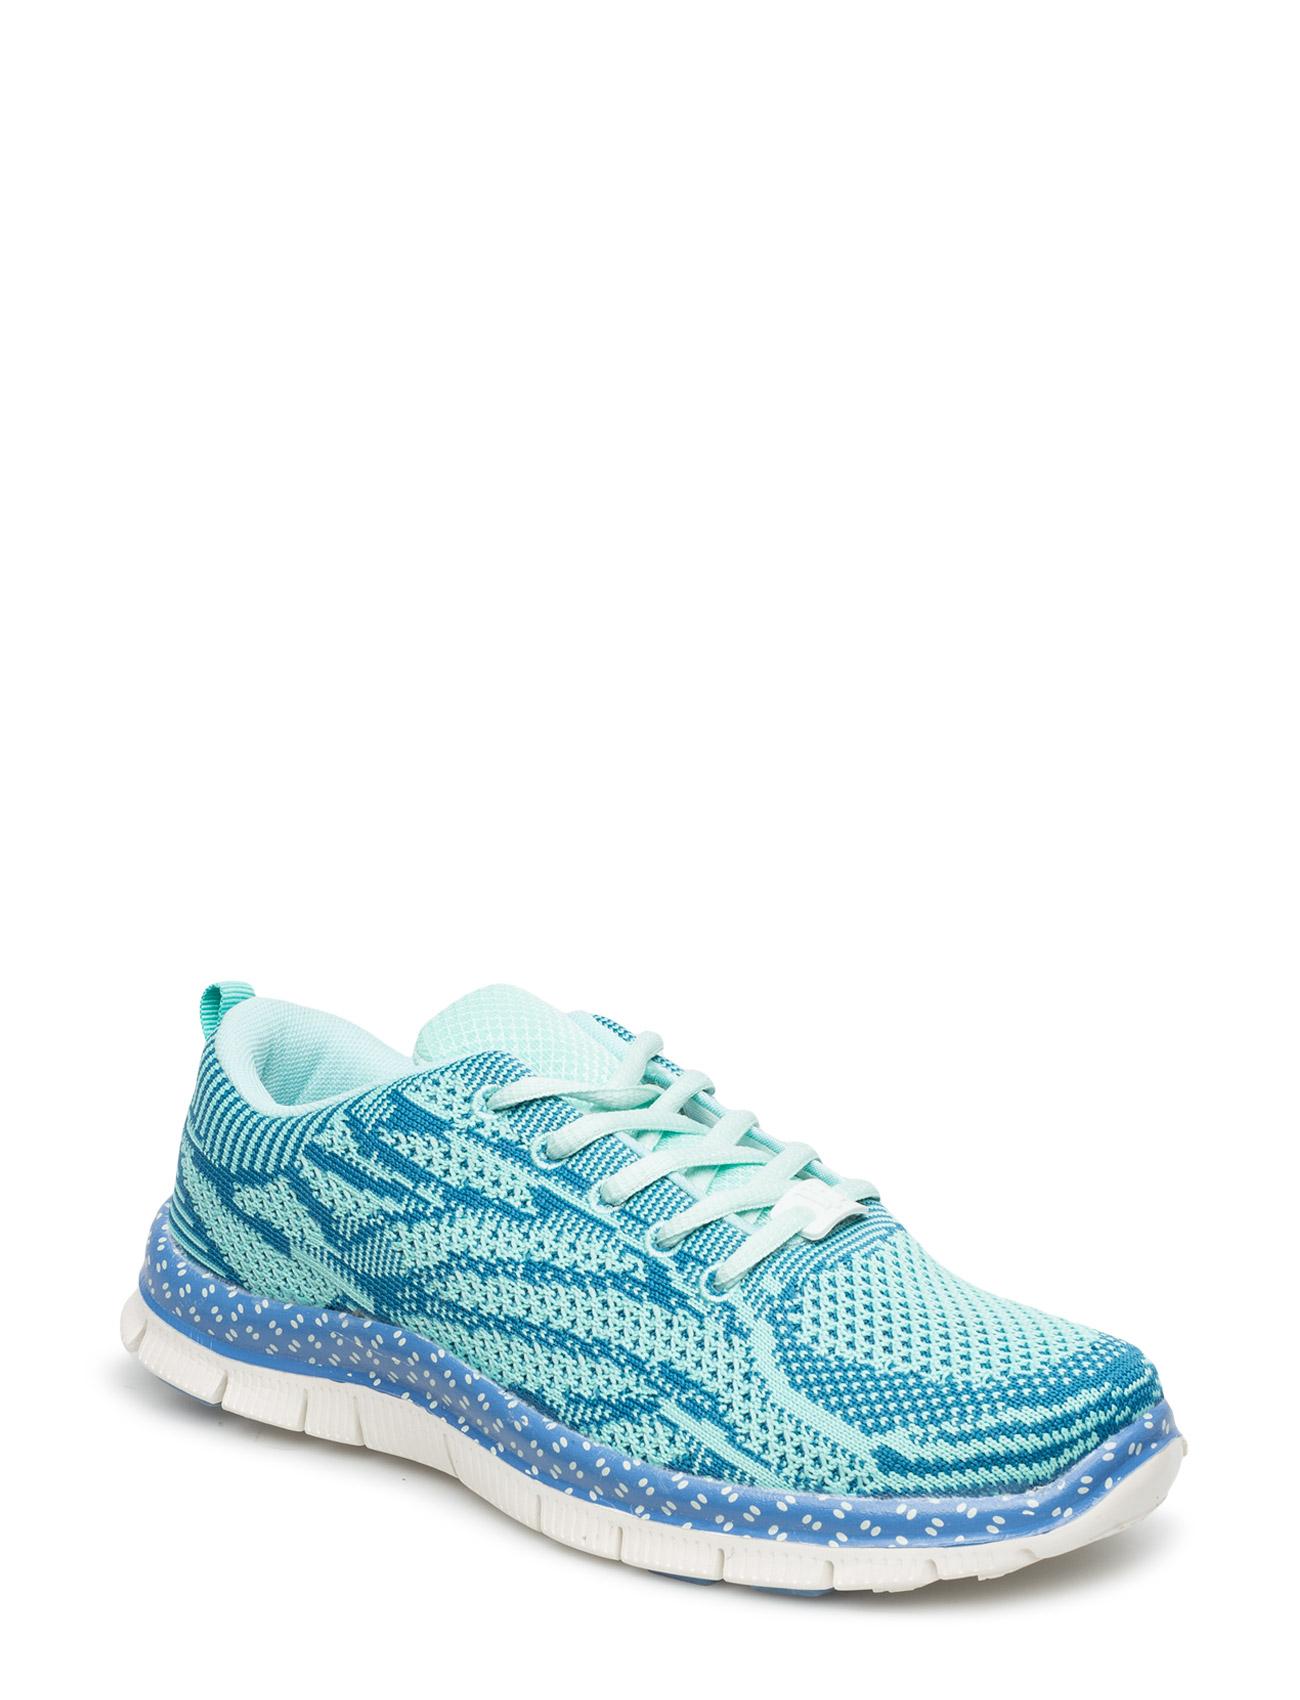 Peony202 Ilse Jacobsen Sneakers til Damer i Neon Coral